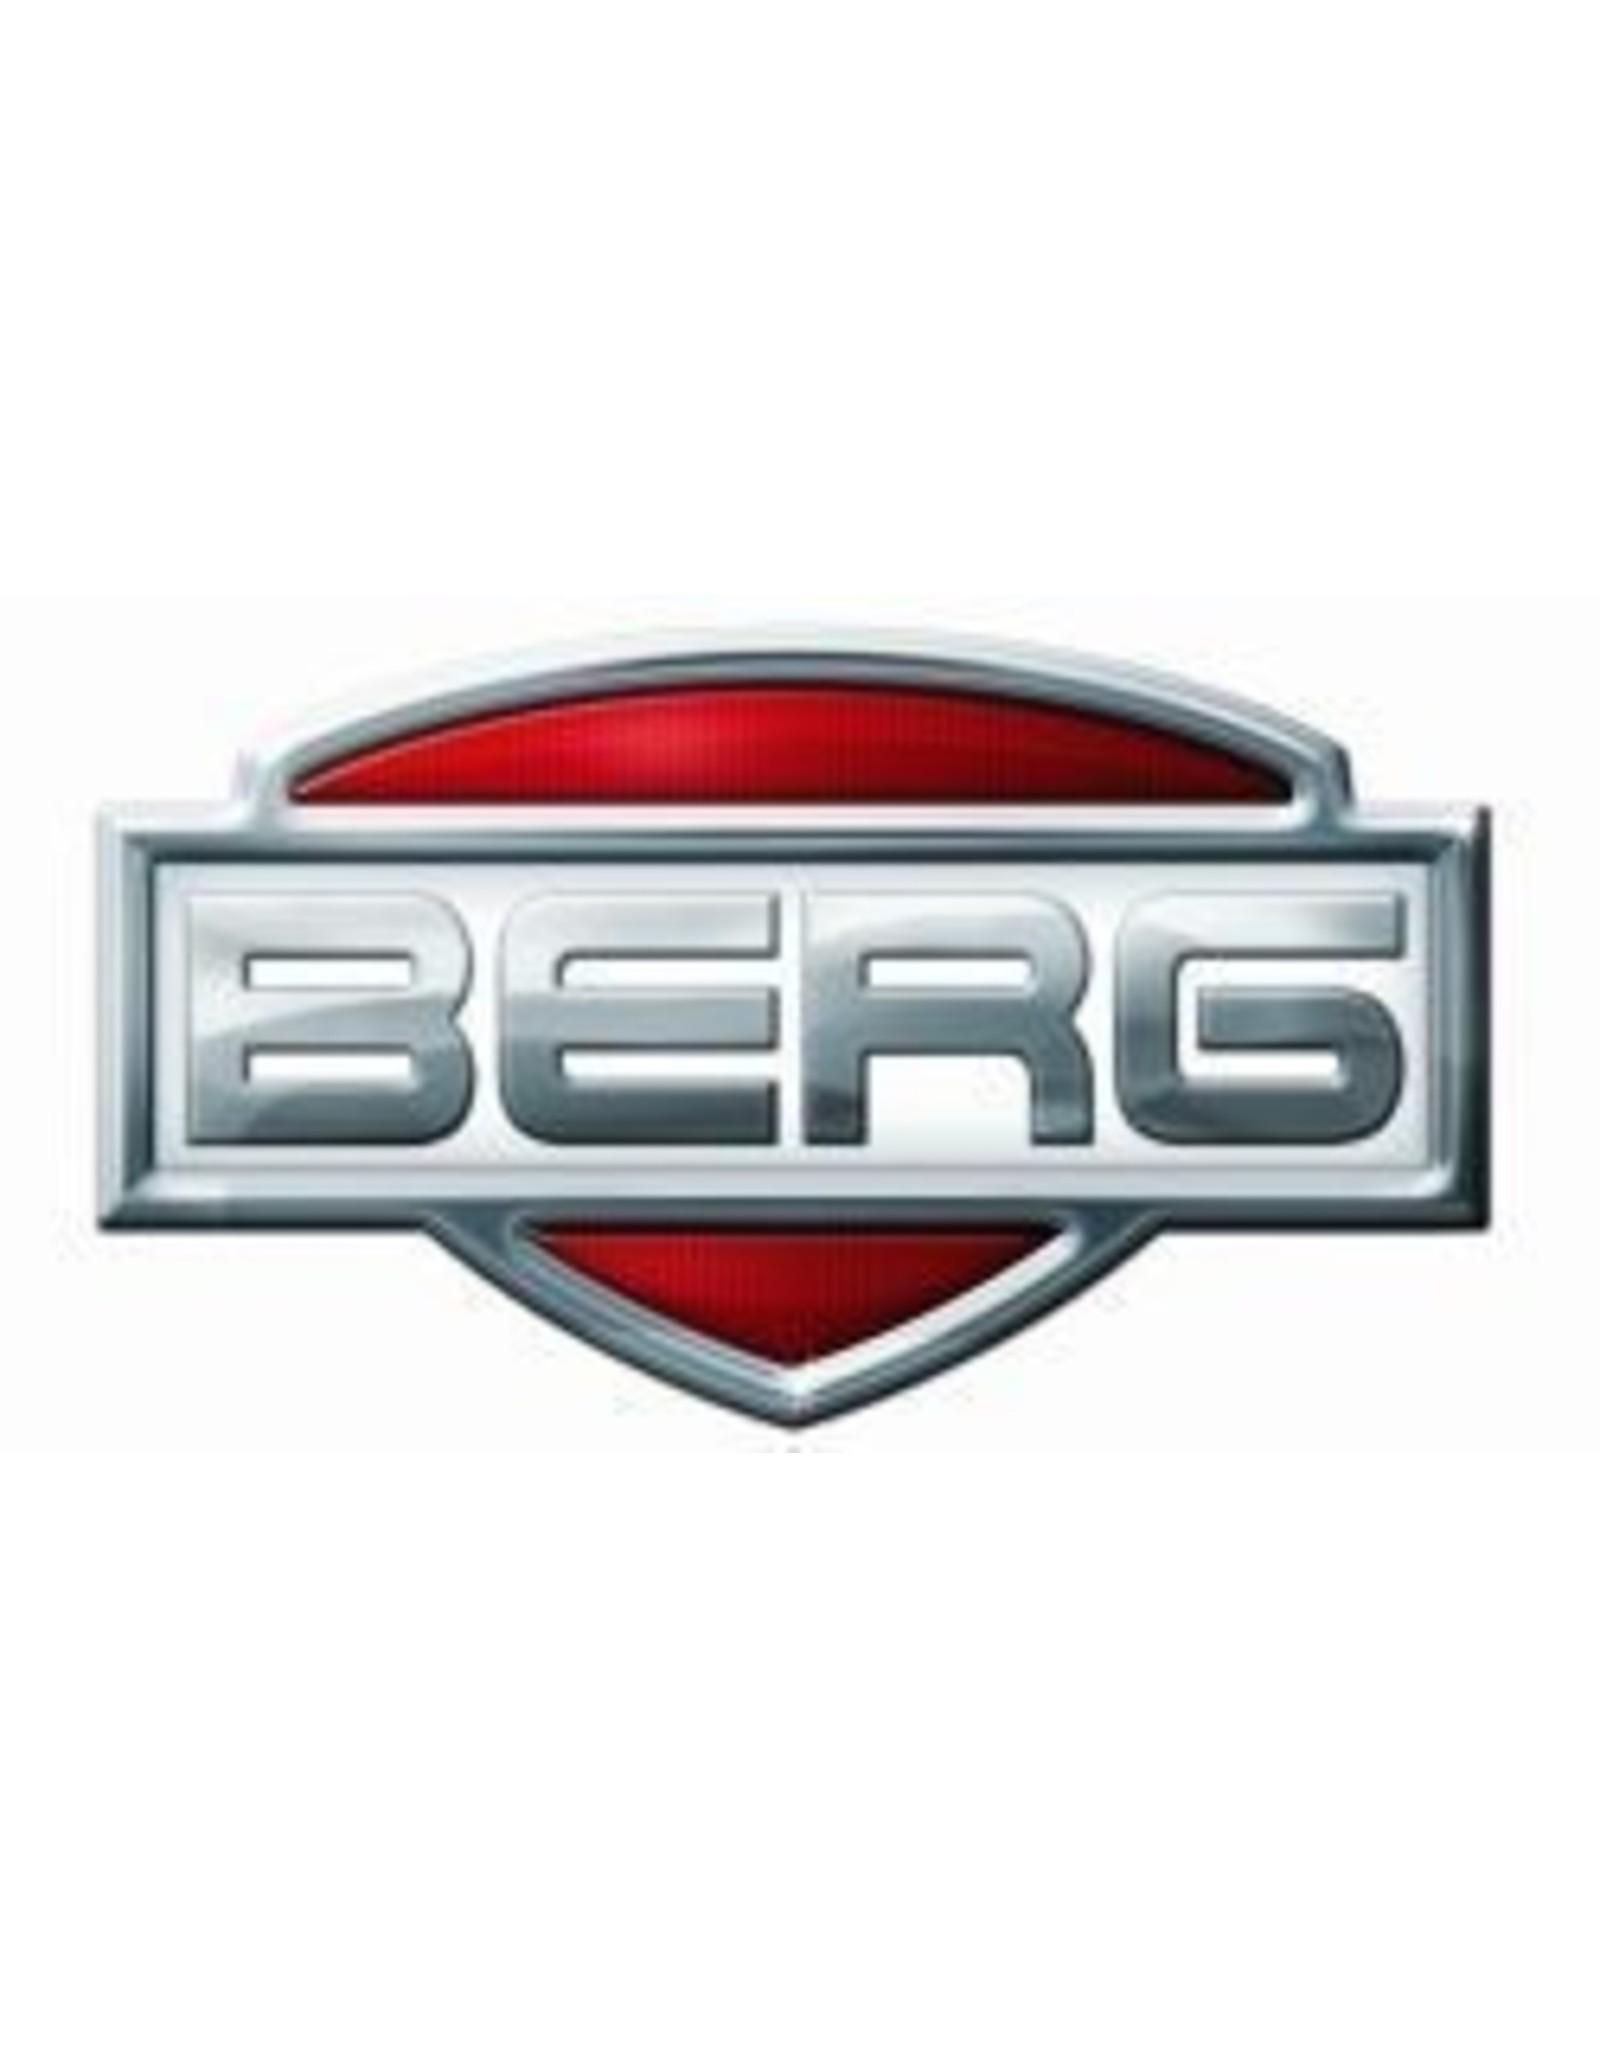 BERG BERG Kotflügel-set vorne Race - weiss